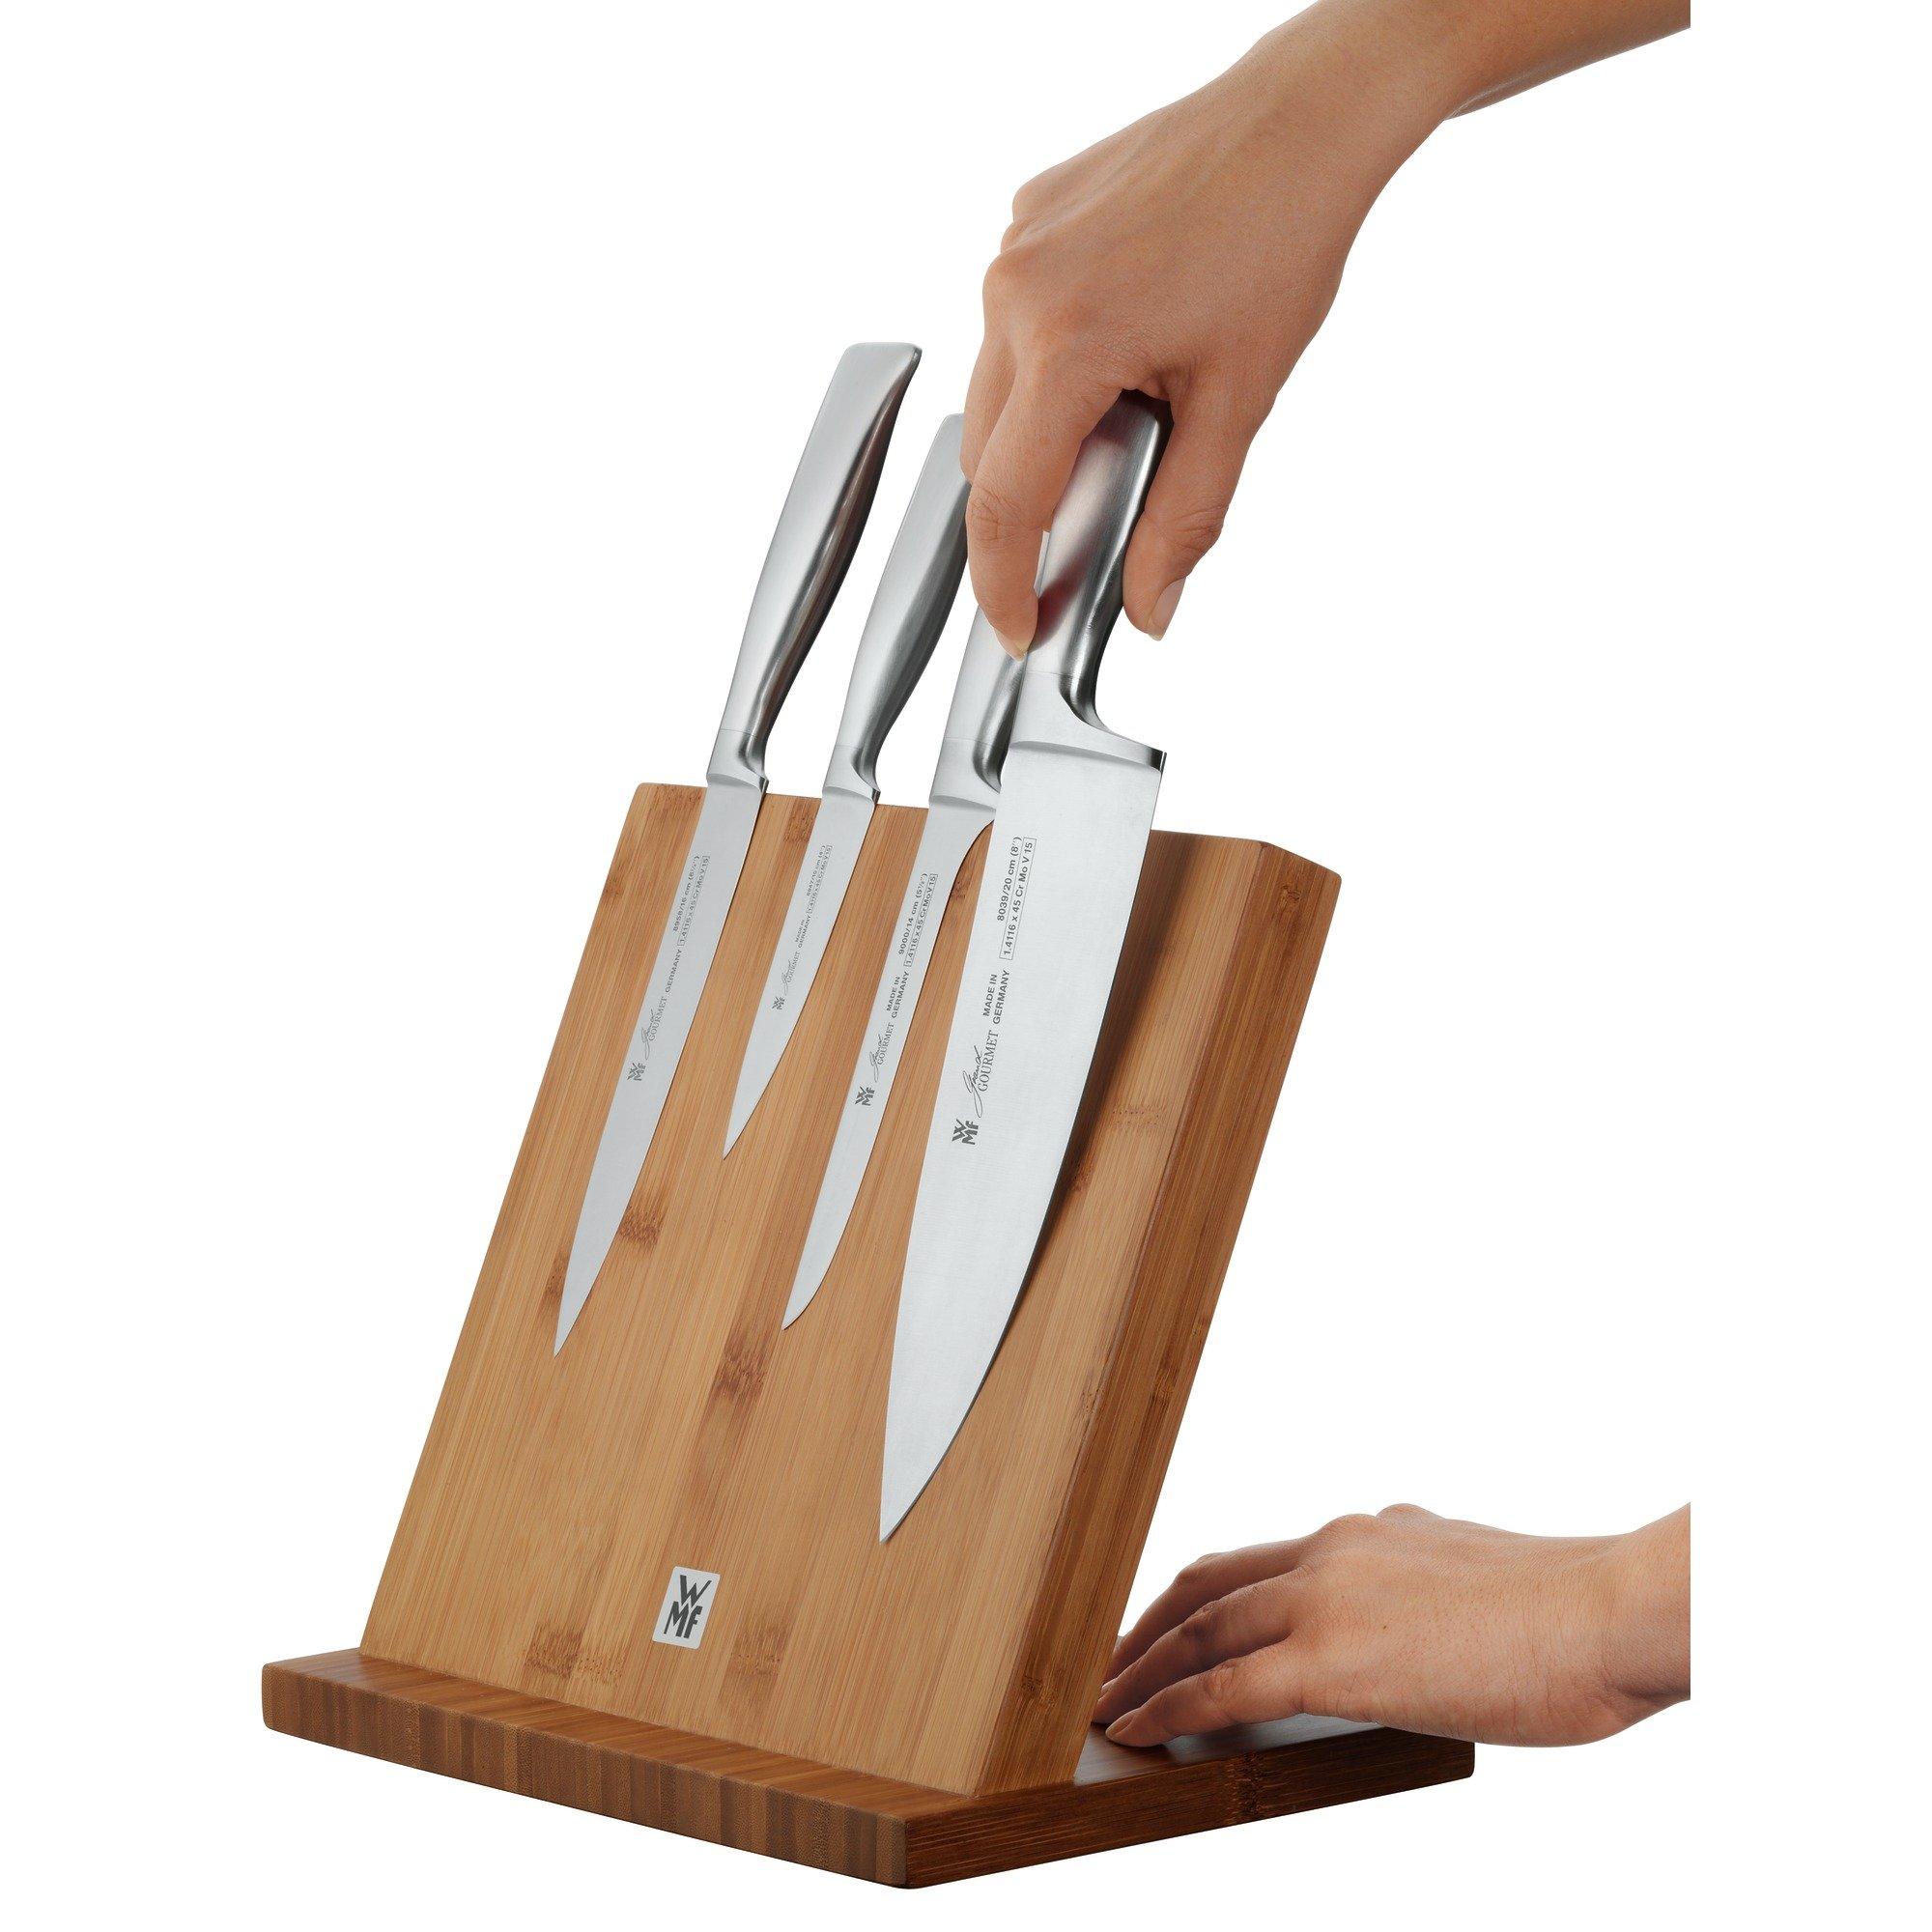 WMF Wood Empty Magnetic Knife Block, Beige by WMF (Image #2)